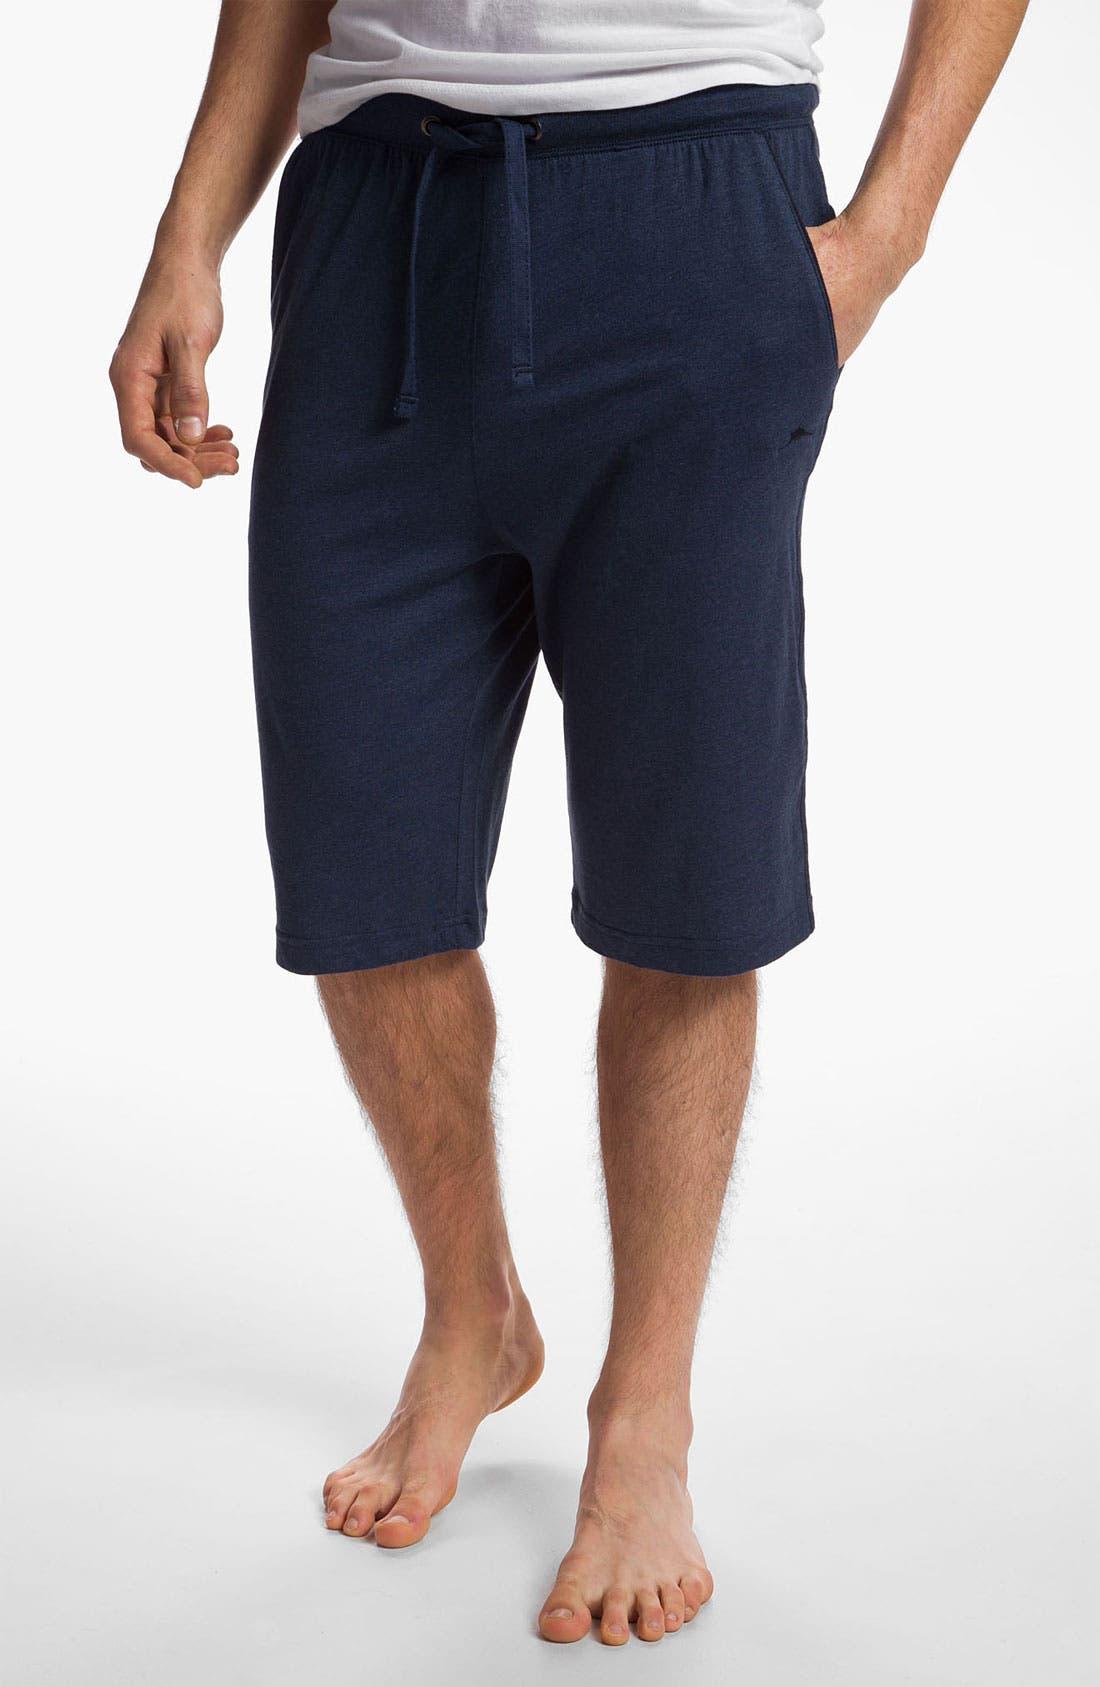 Alternate Image 1 Selected - Tommy Bahama Cotton Blend Lounge Shorts